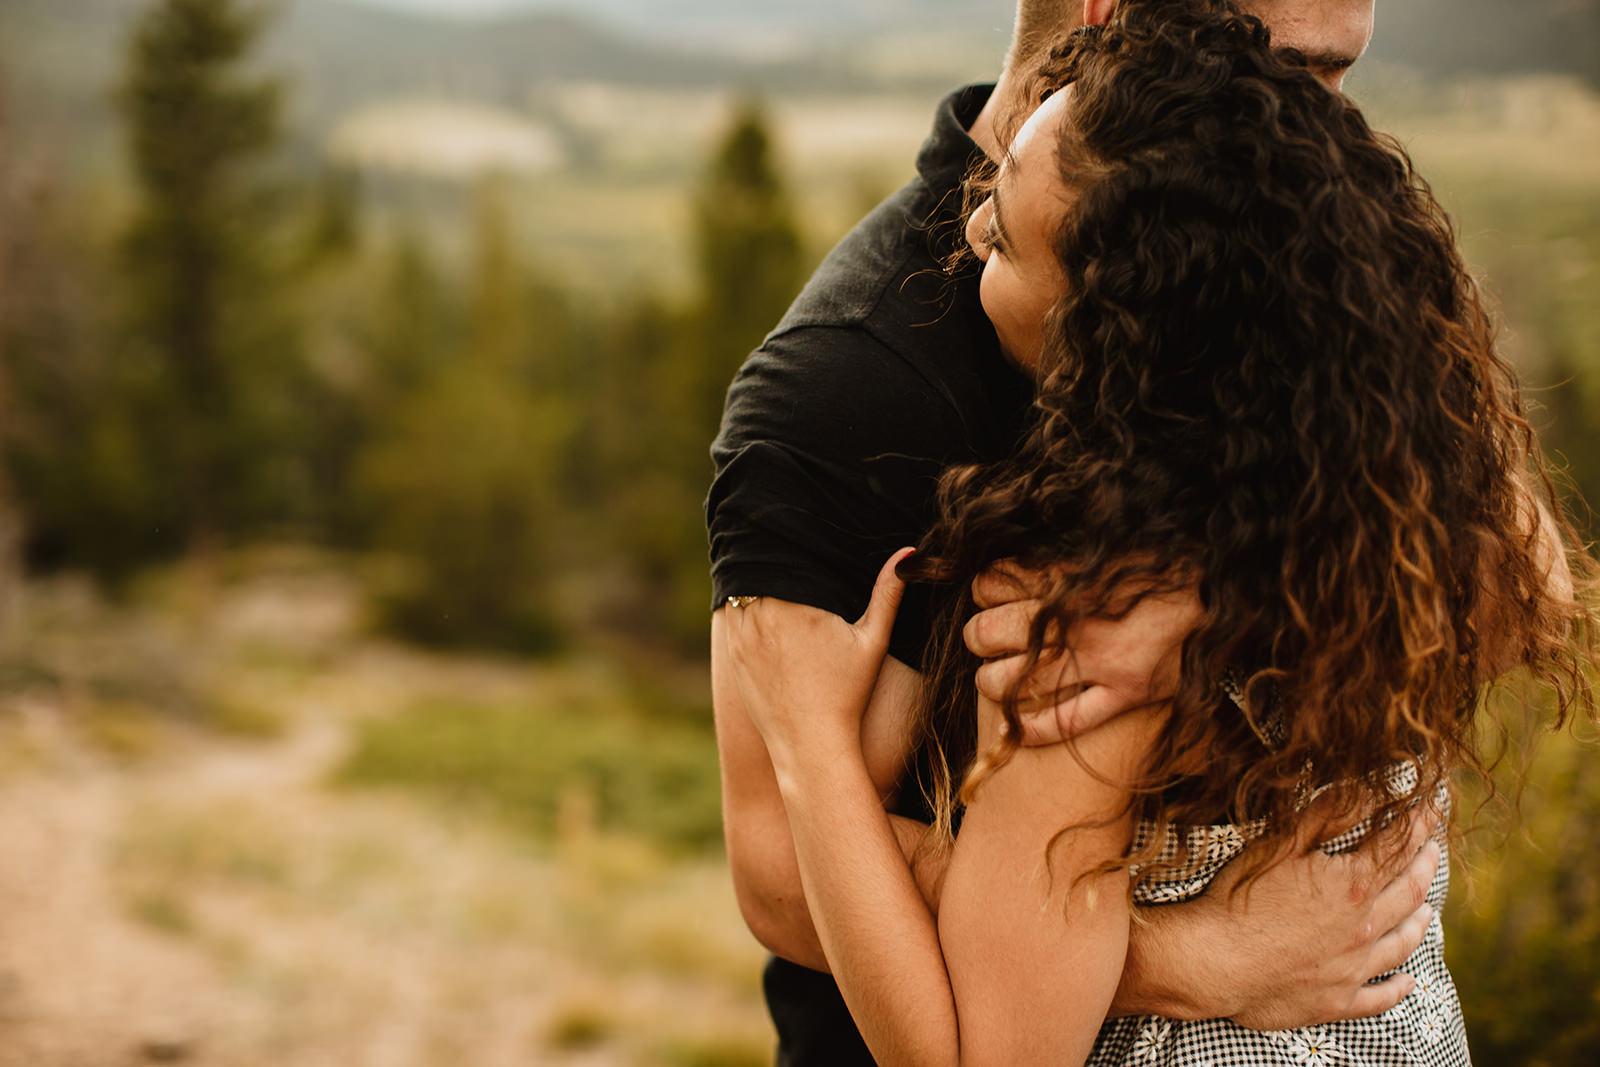 Liz Osban Photography Cheyenne Wyoming Engagement Wedding Photographer couple adventure elopement wedding laramie denver fort collins colorado rocky mountain national park12.jpg